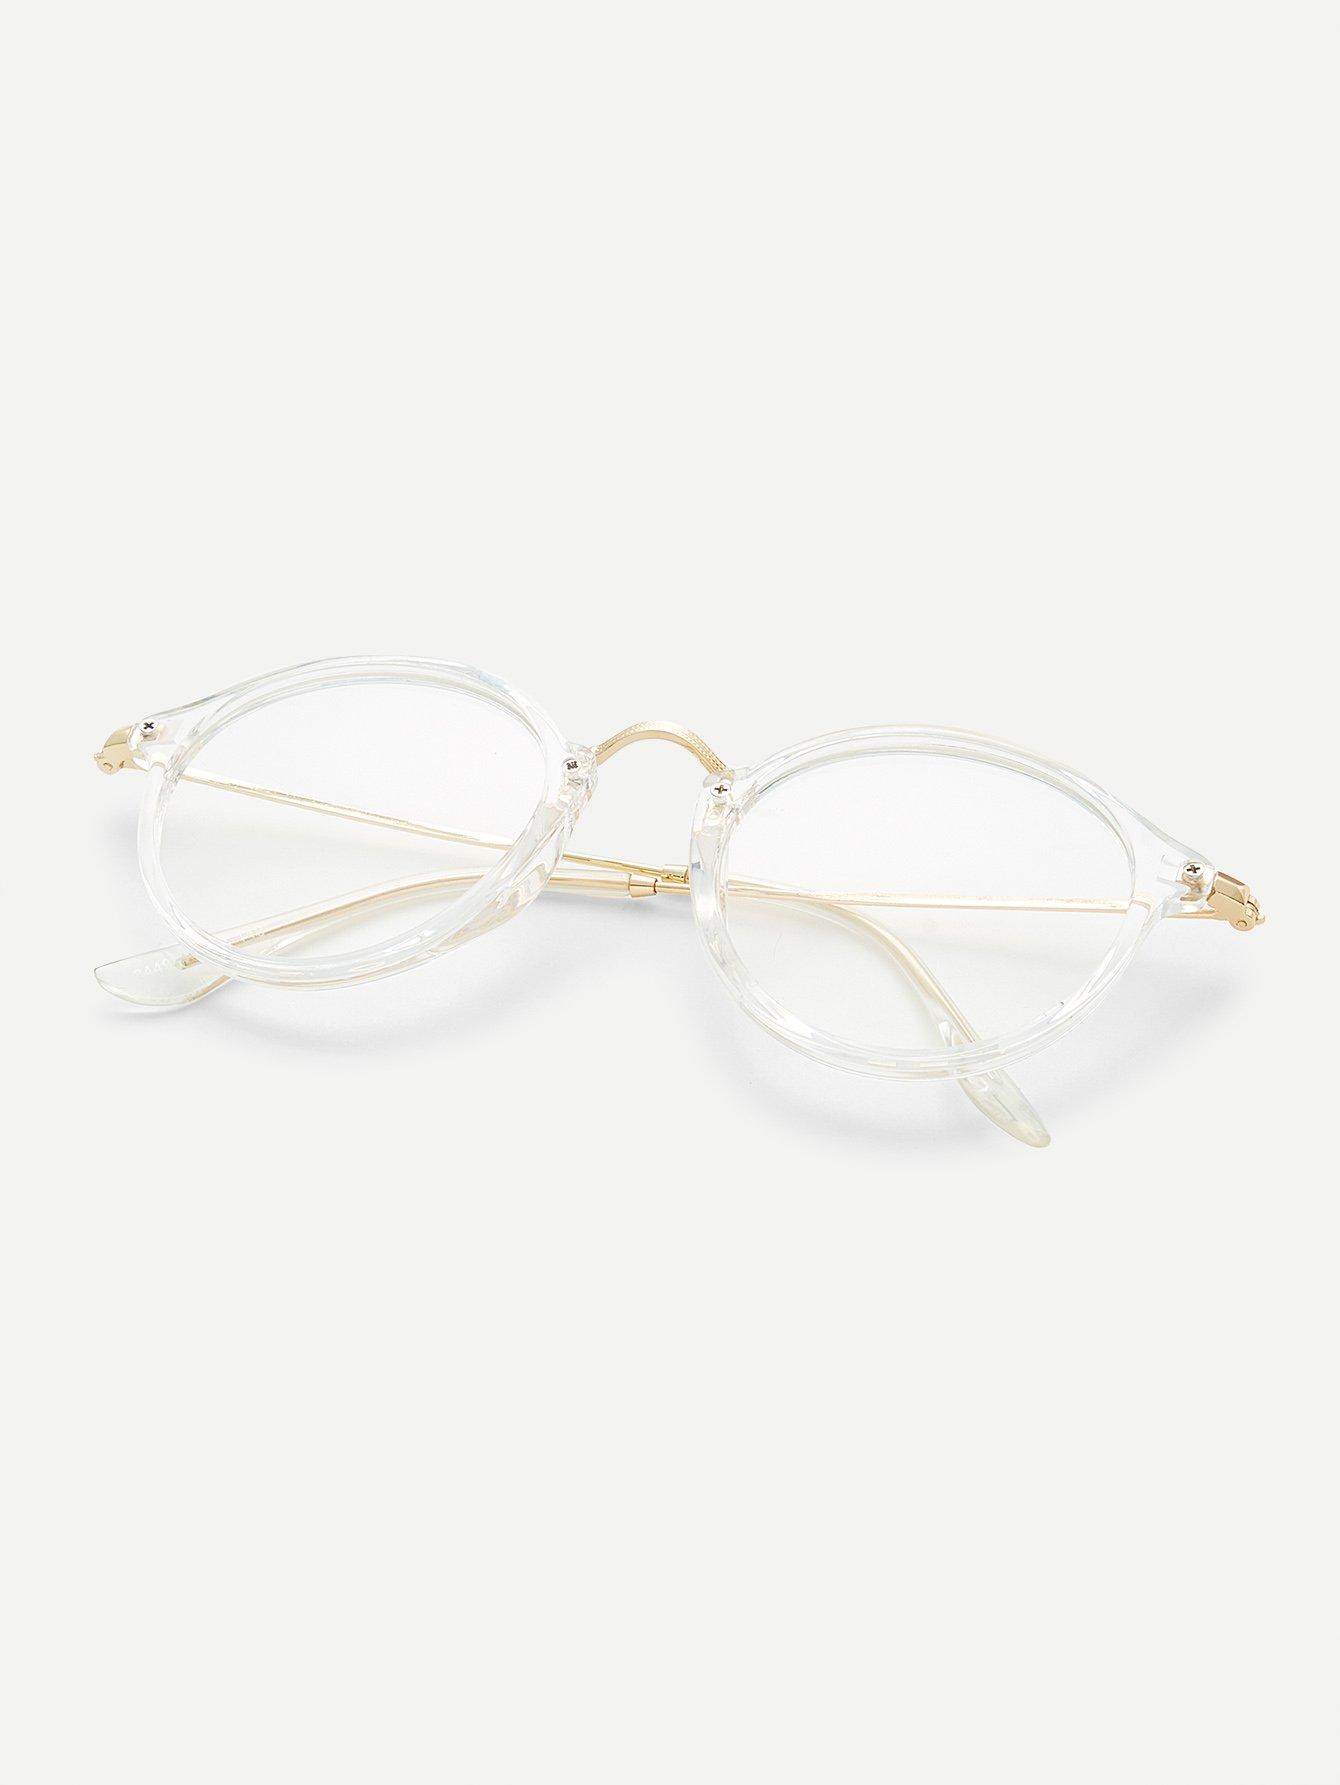 Gafas con marco transparente con barra superior metálica -Spanish Romwe